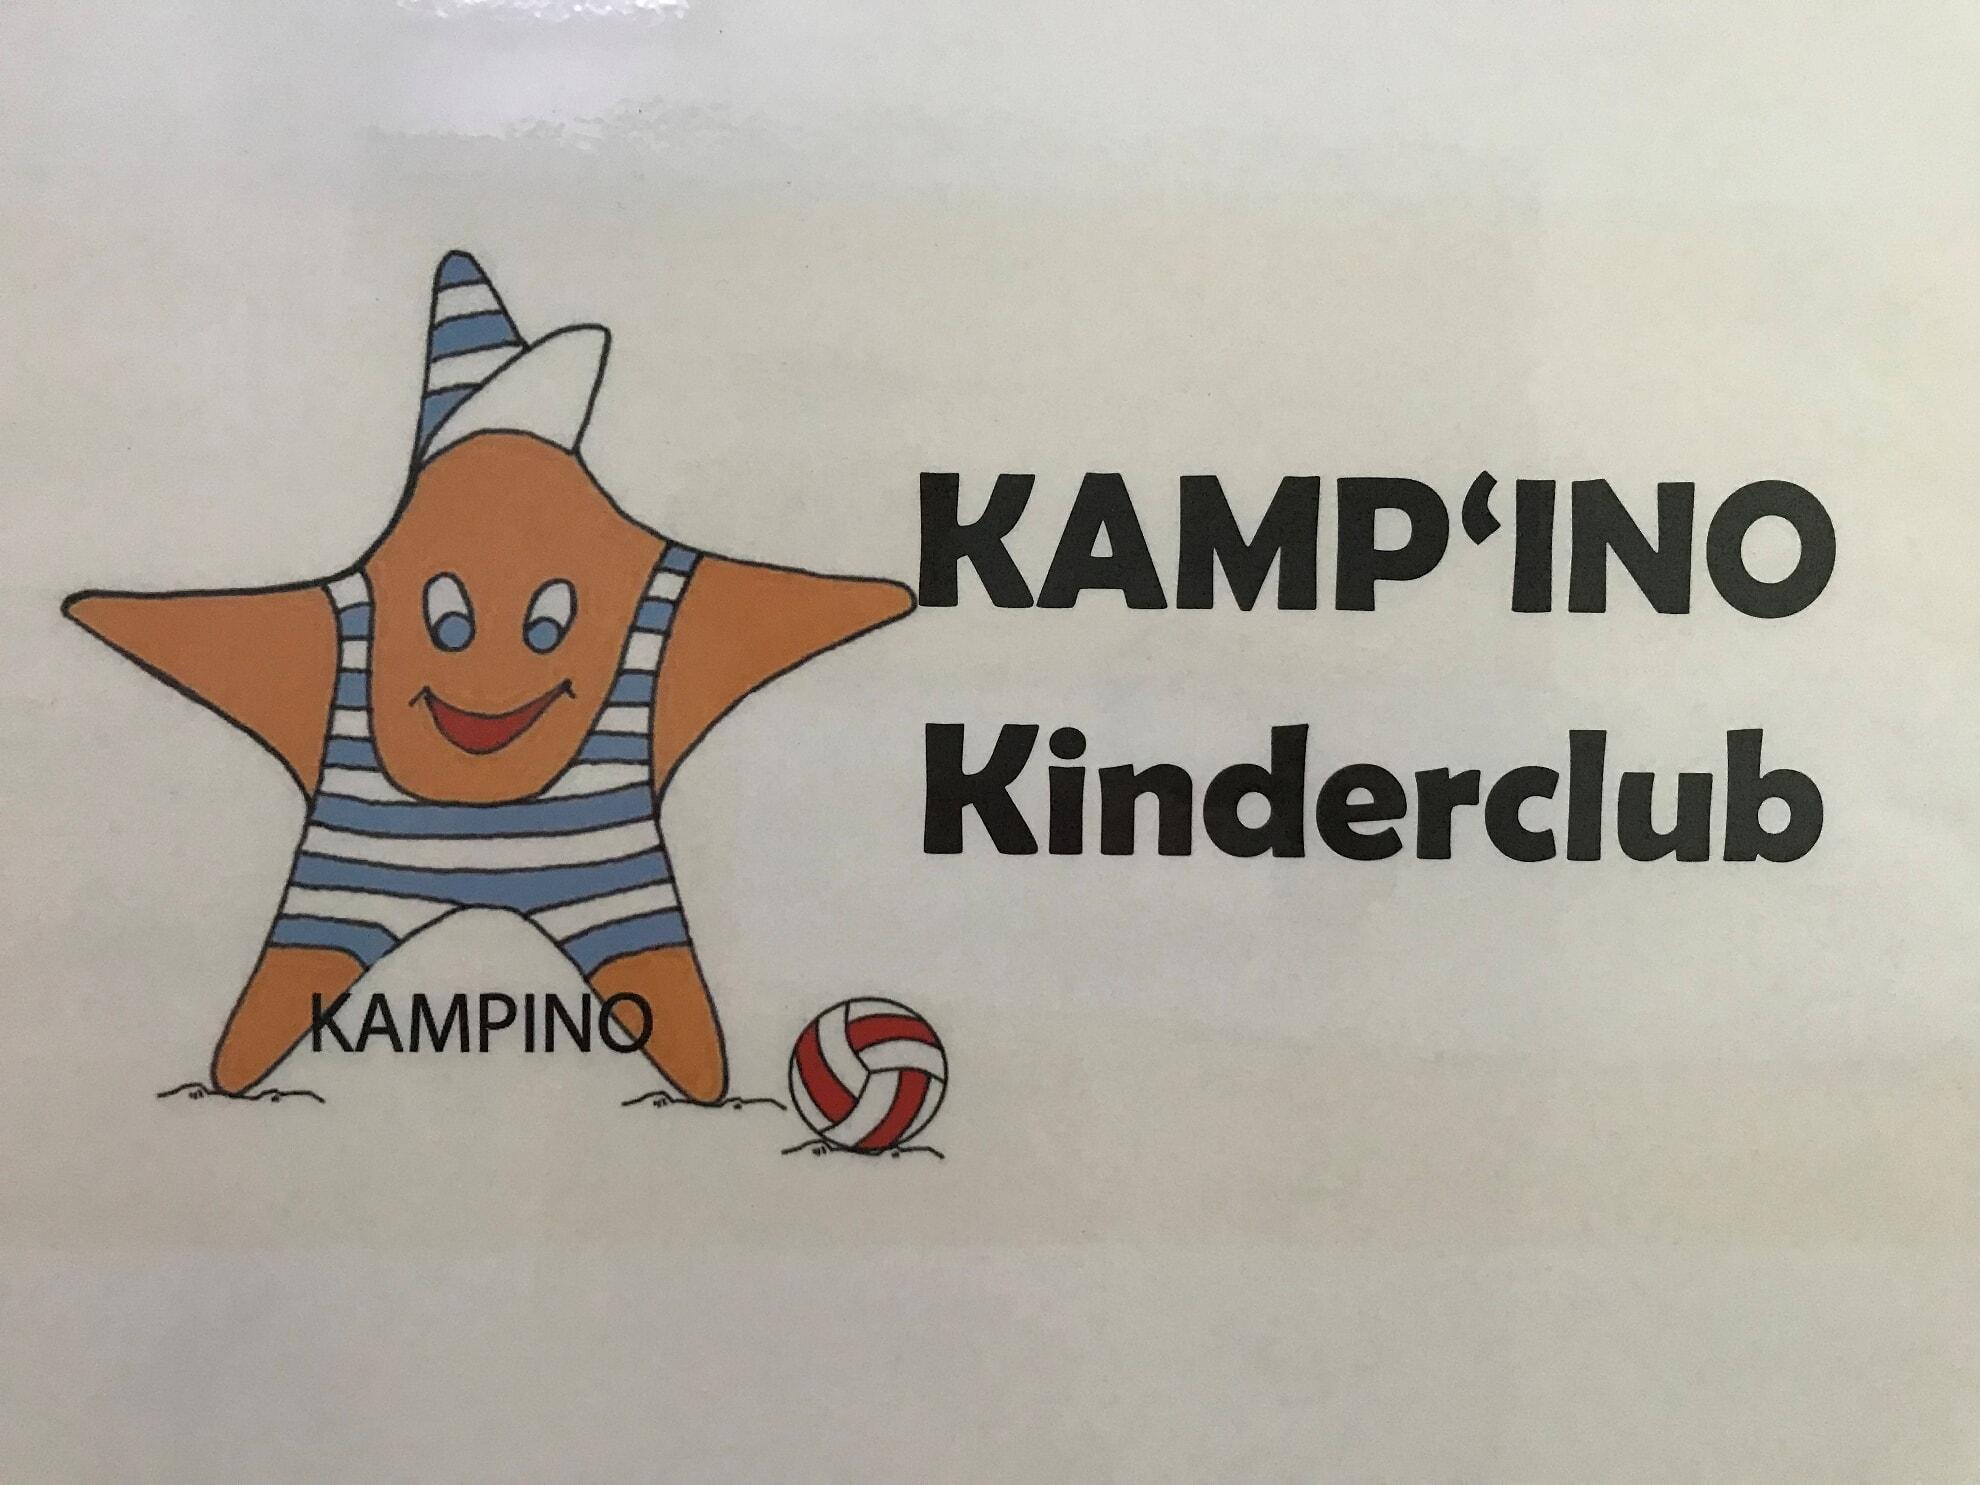 Kamp'ino Kinderclub